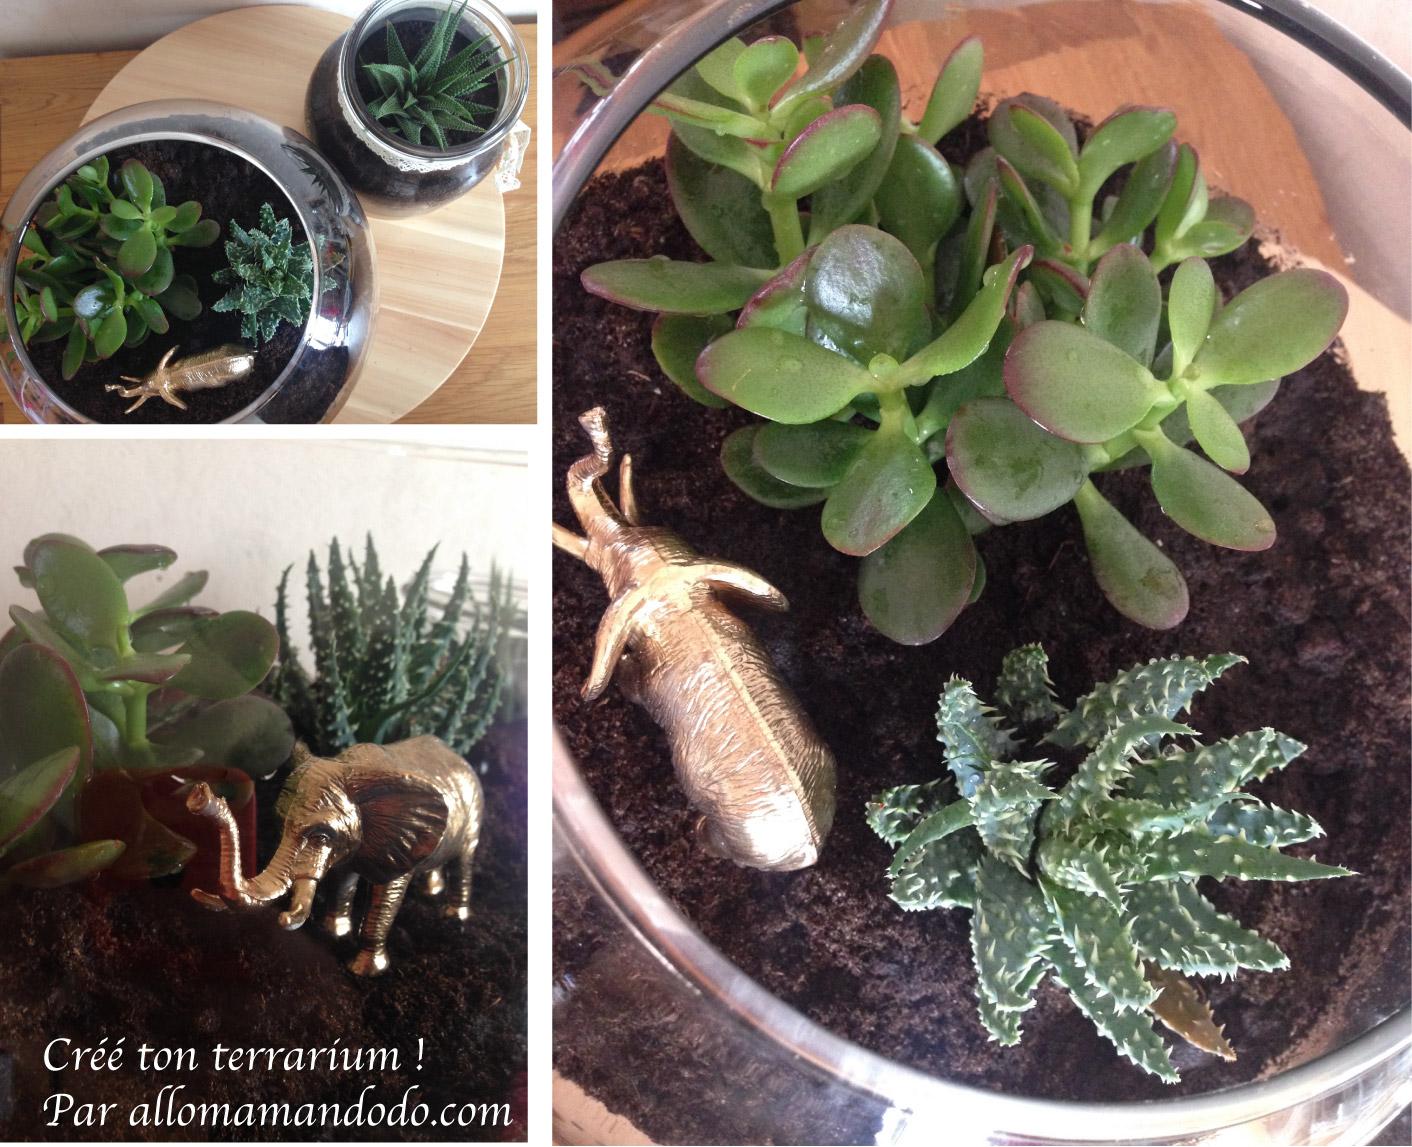 diy le terrarium un petit jardin d 39 int rieur allo maman dodo. Black Bedroom Furniture Sets. Home Design Ideas